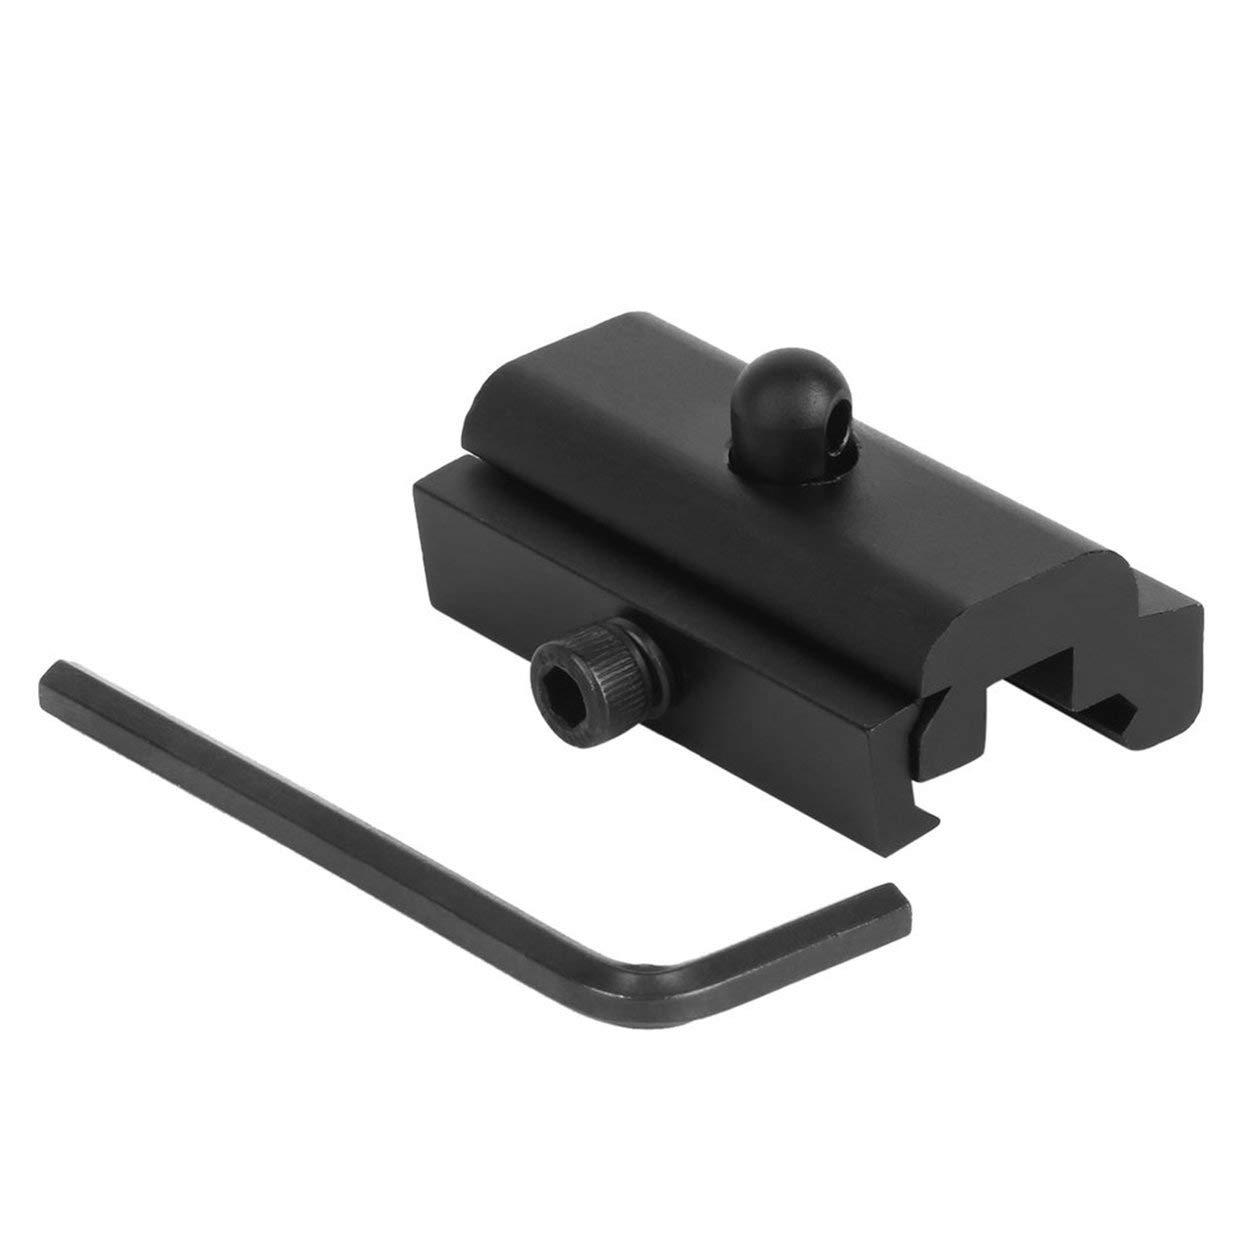 Lorenlli Tactique Chasse Sling Pivot Adaptateur Picatinny Rail Rail Harris Style Rifle Montage Bipod Airsoft en Aluminium Durable Mount